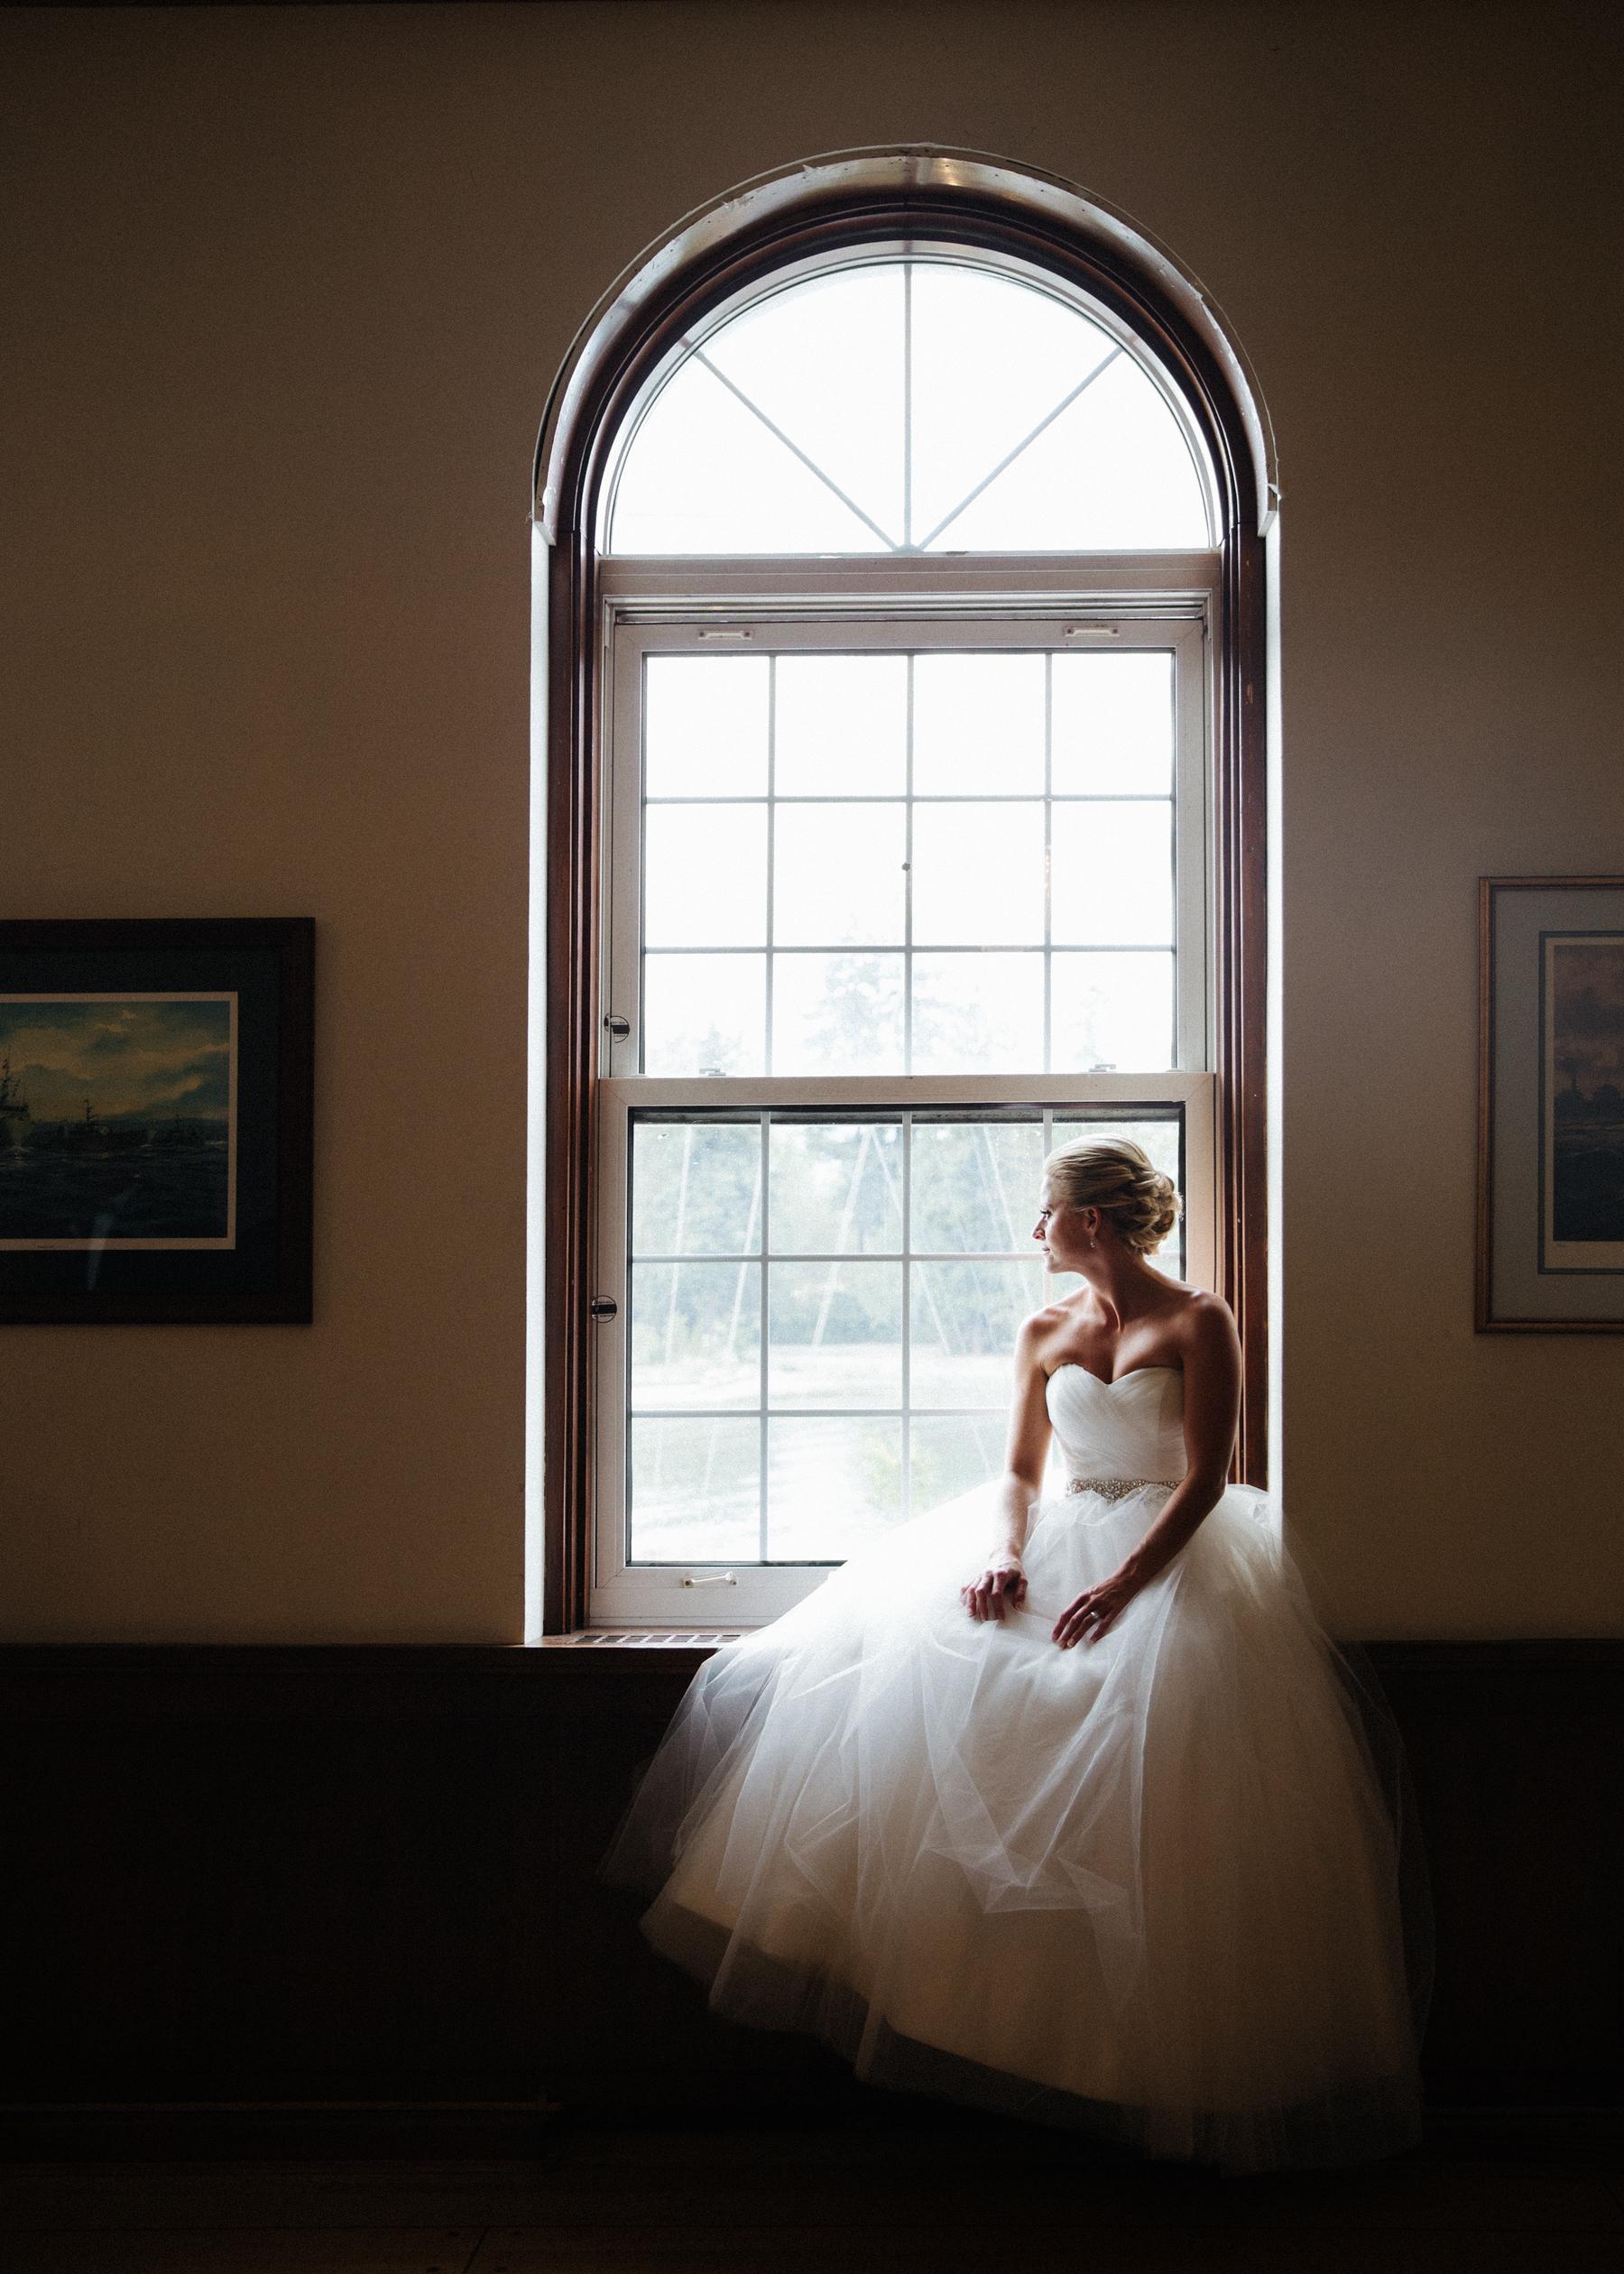 kaoverii_silva_photographer_via-herafilms_kelly_mike_wedding-24.jpg